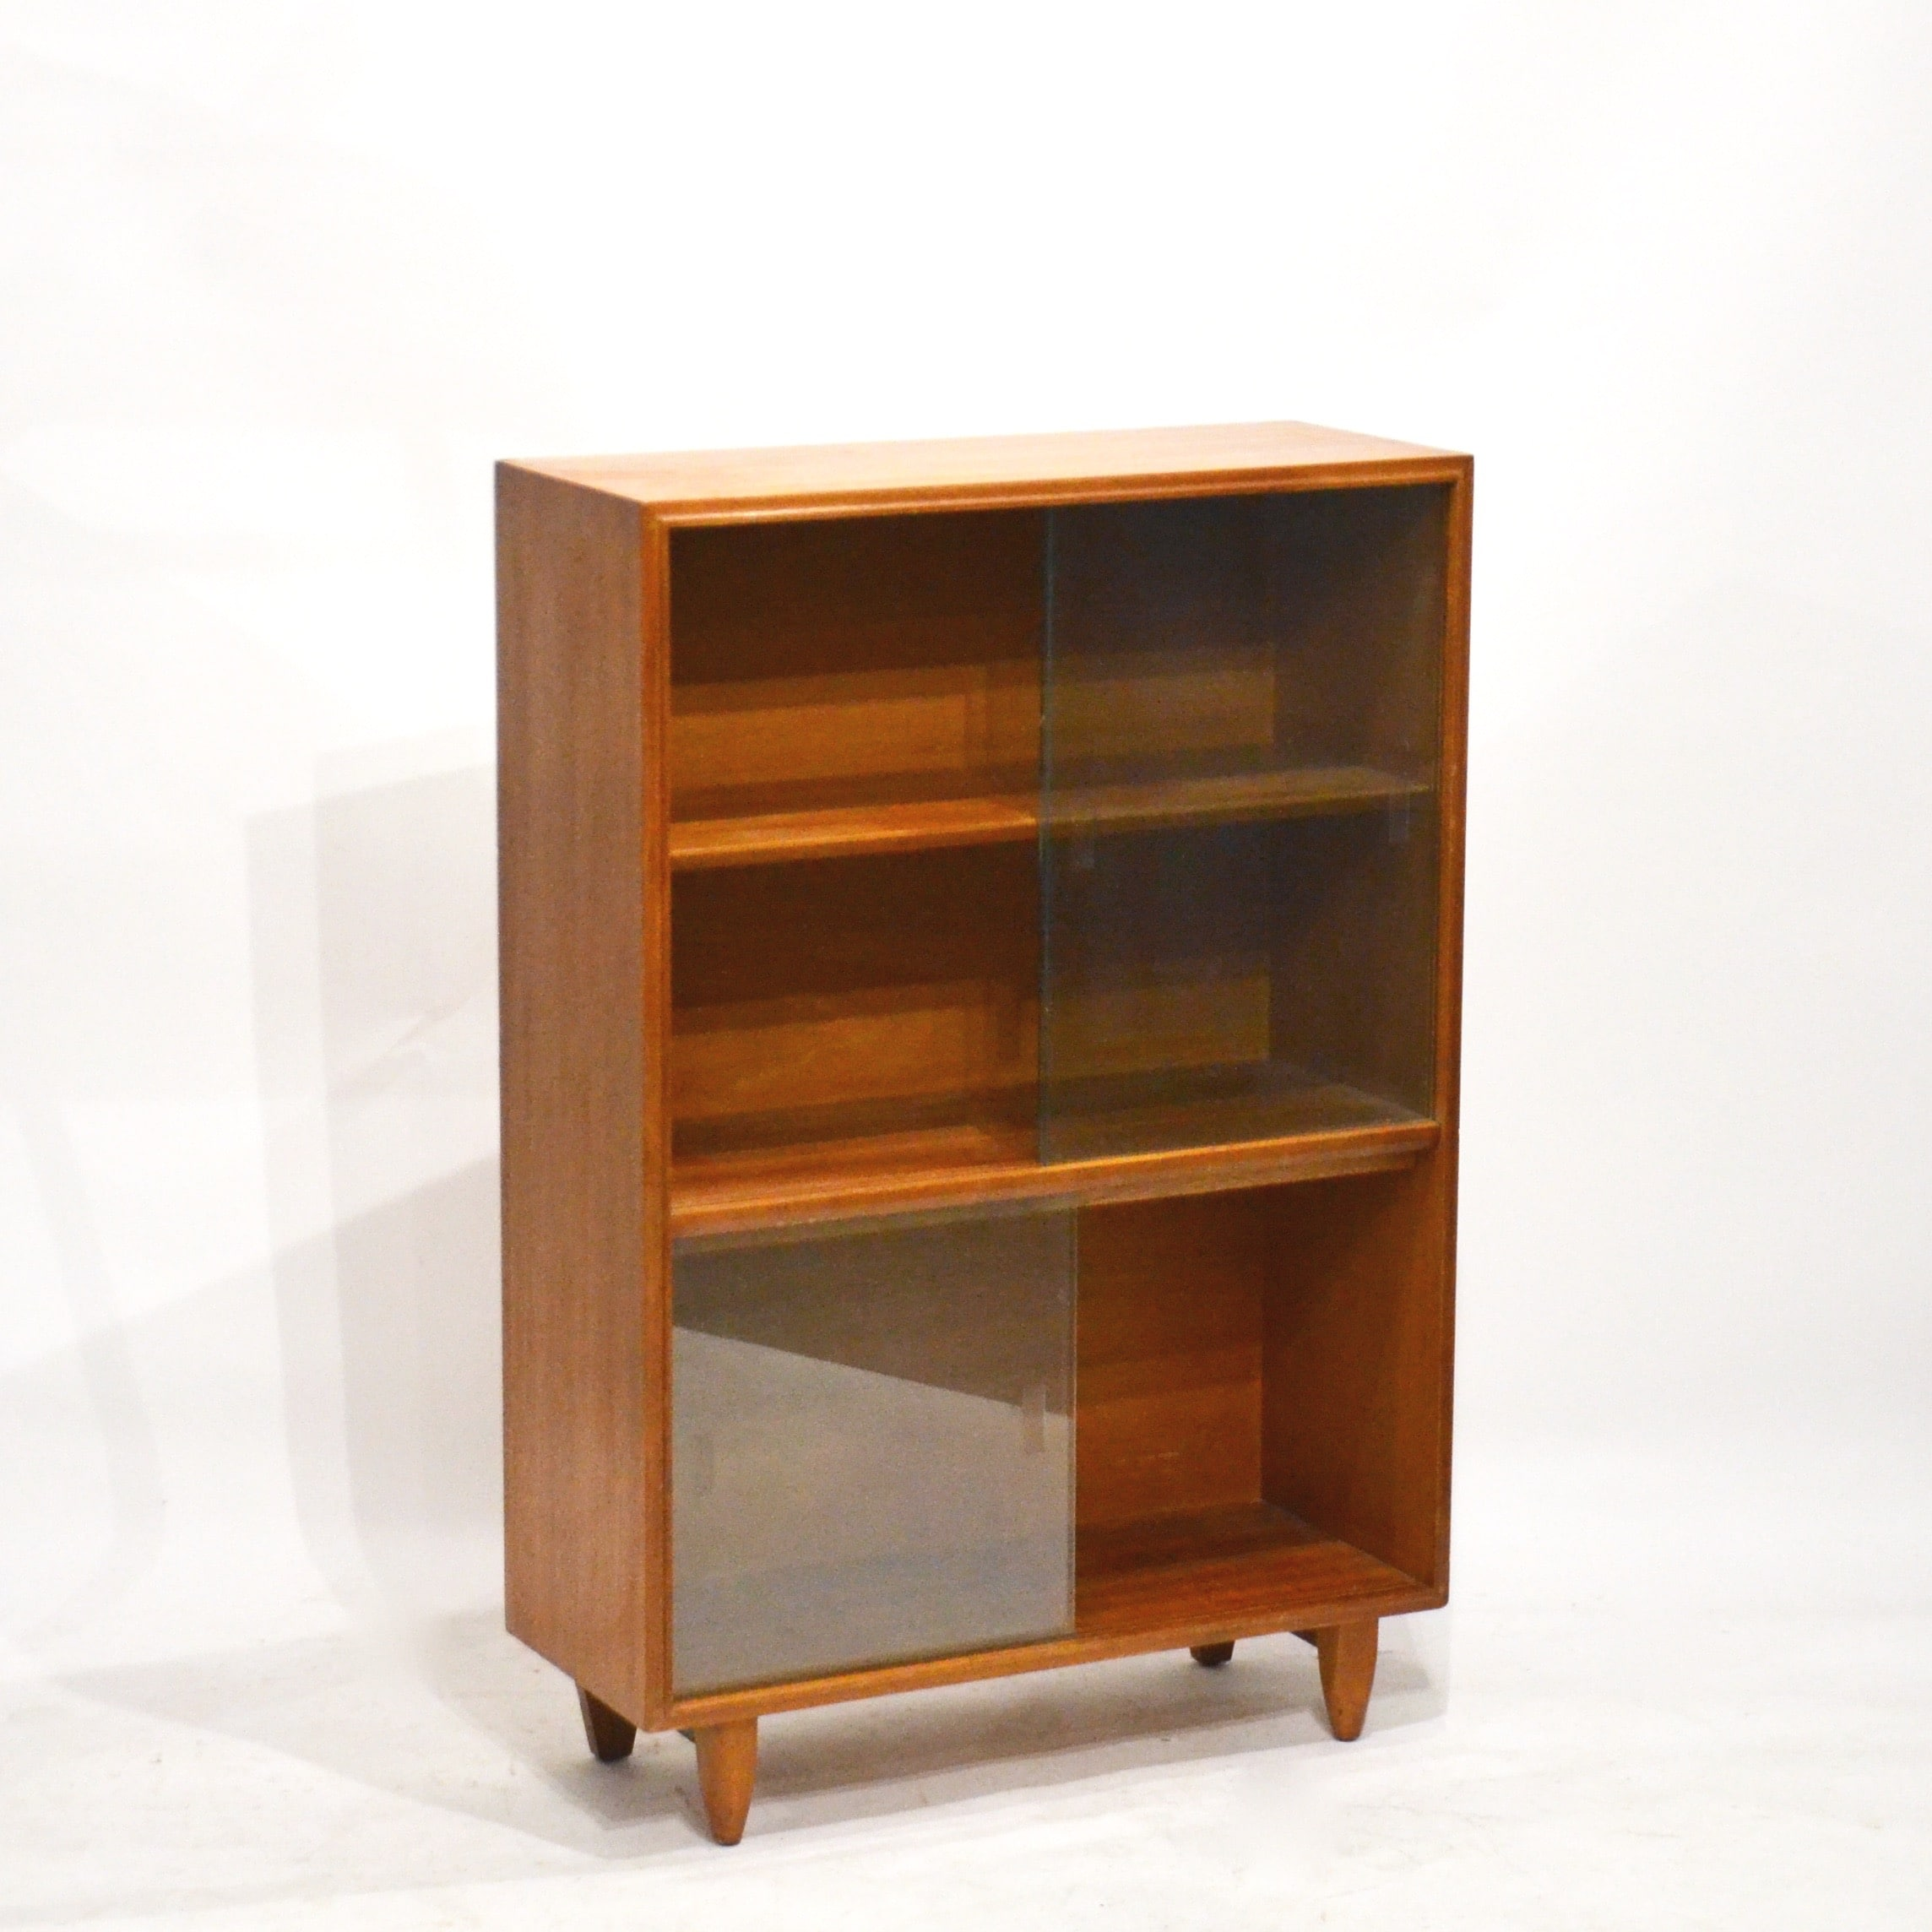 petite biblioth que vitrine ann es 60 bindiesbindies. Black Bedroom Furniture Sets. Home Design Ideas